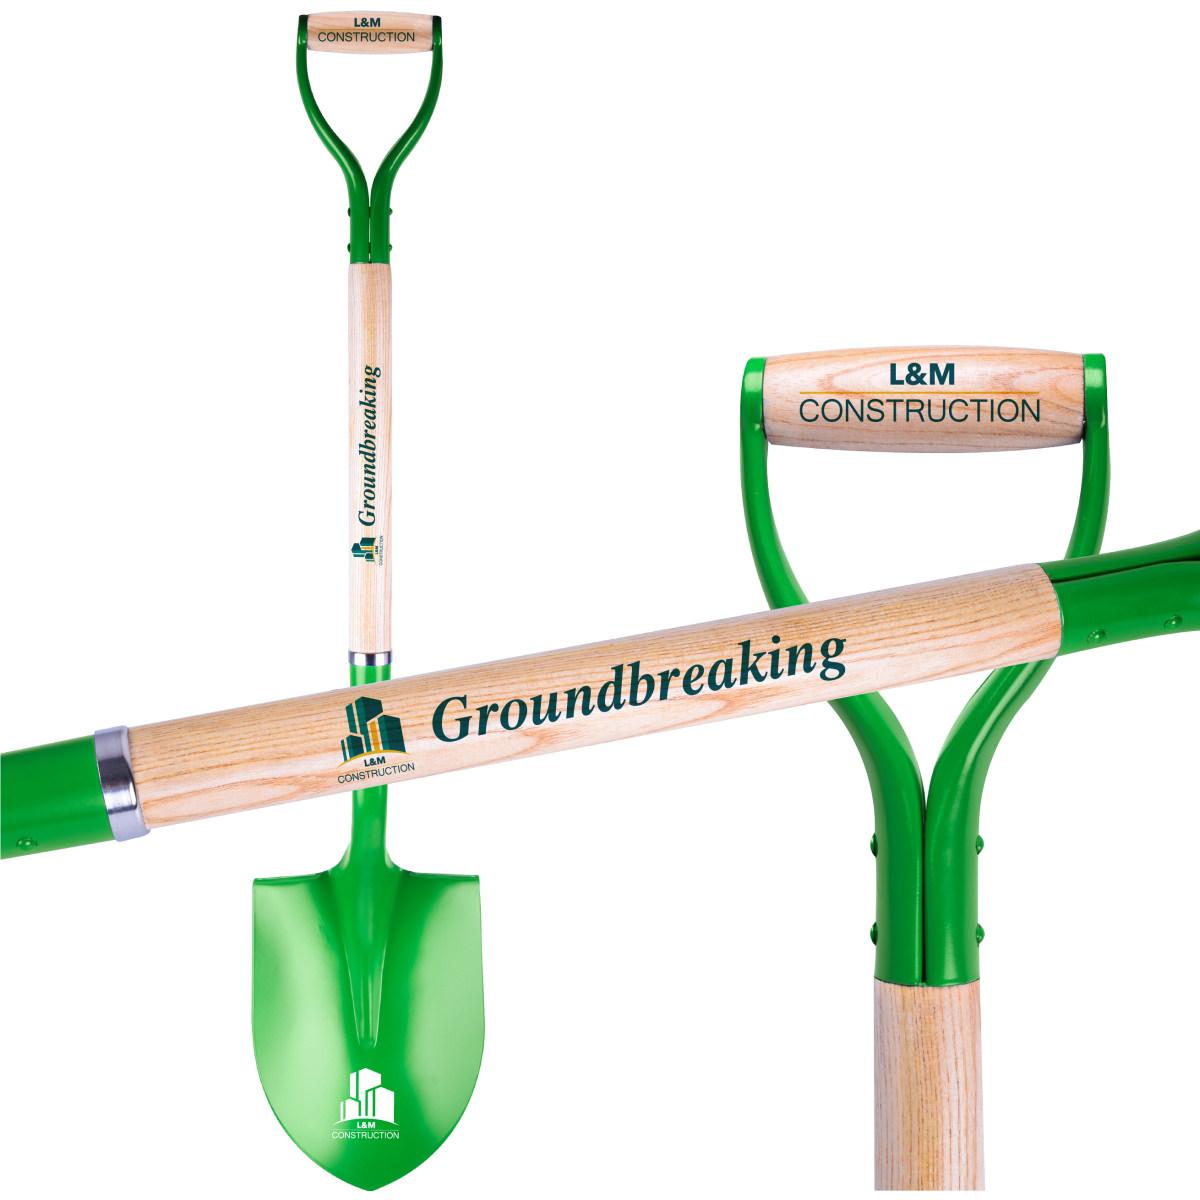 Green Groundbreaking Shovel direct print